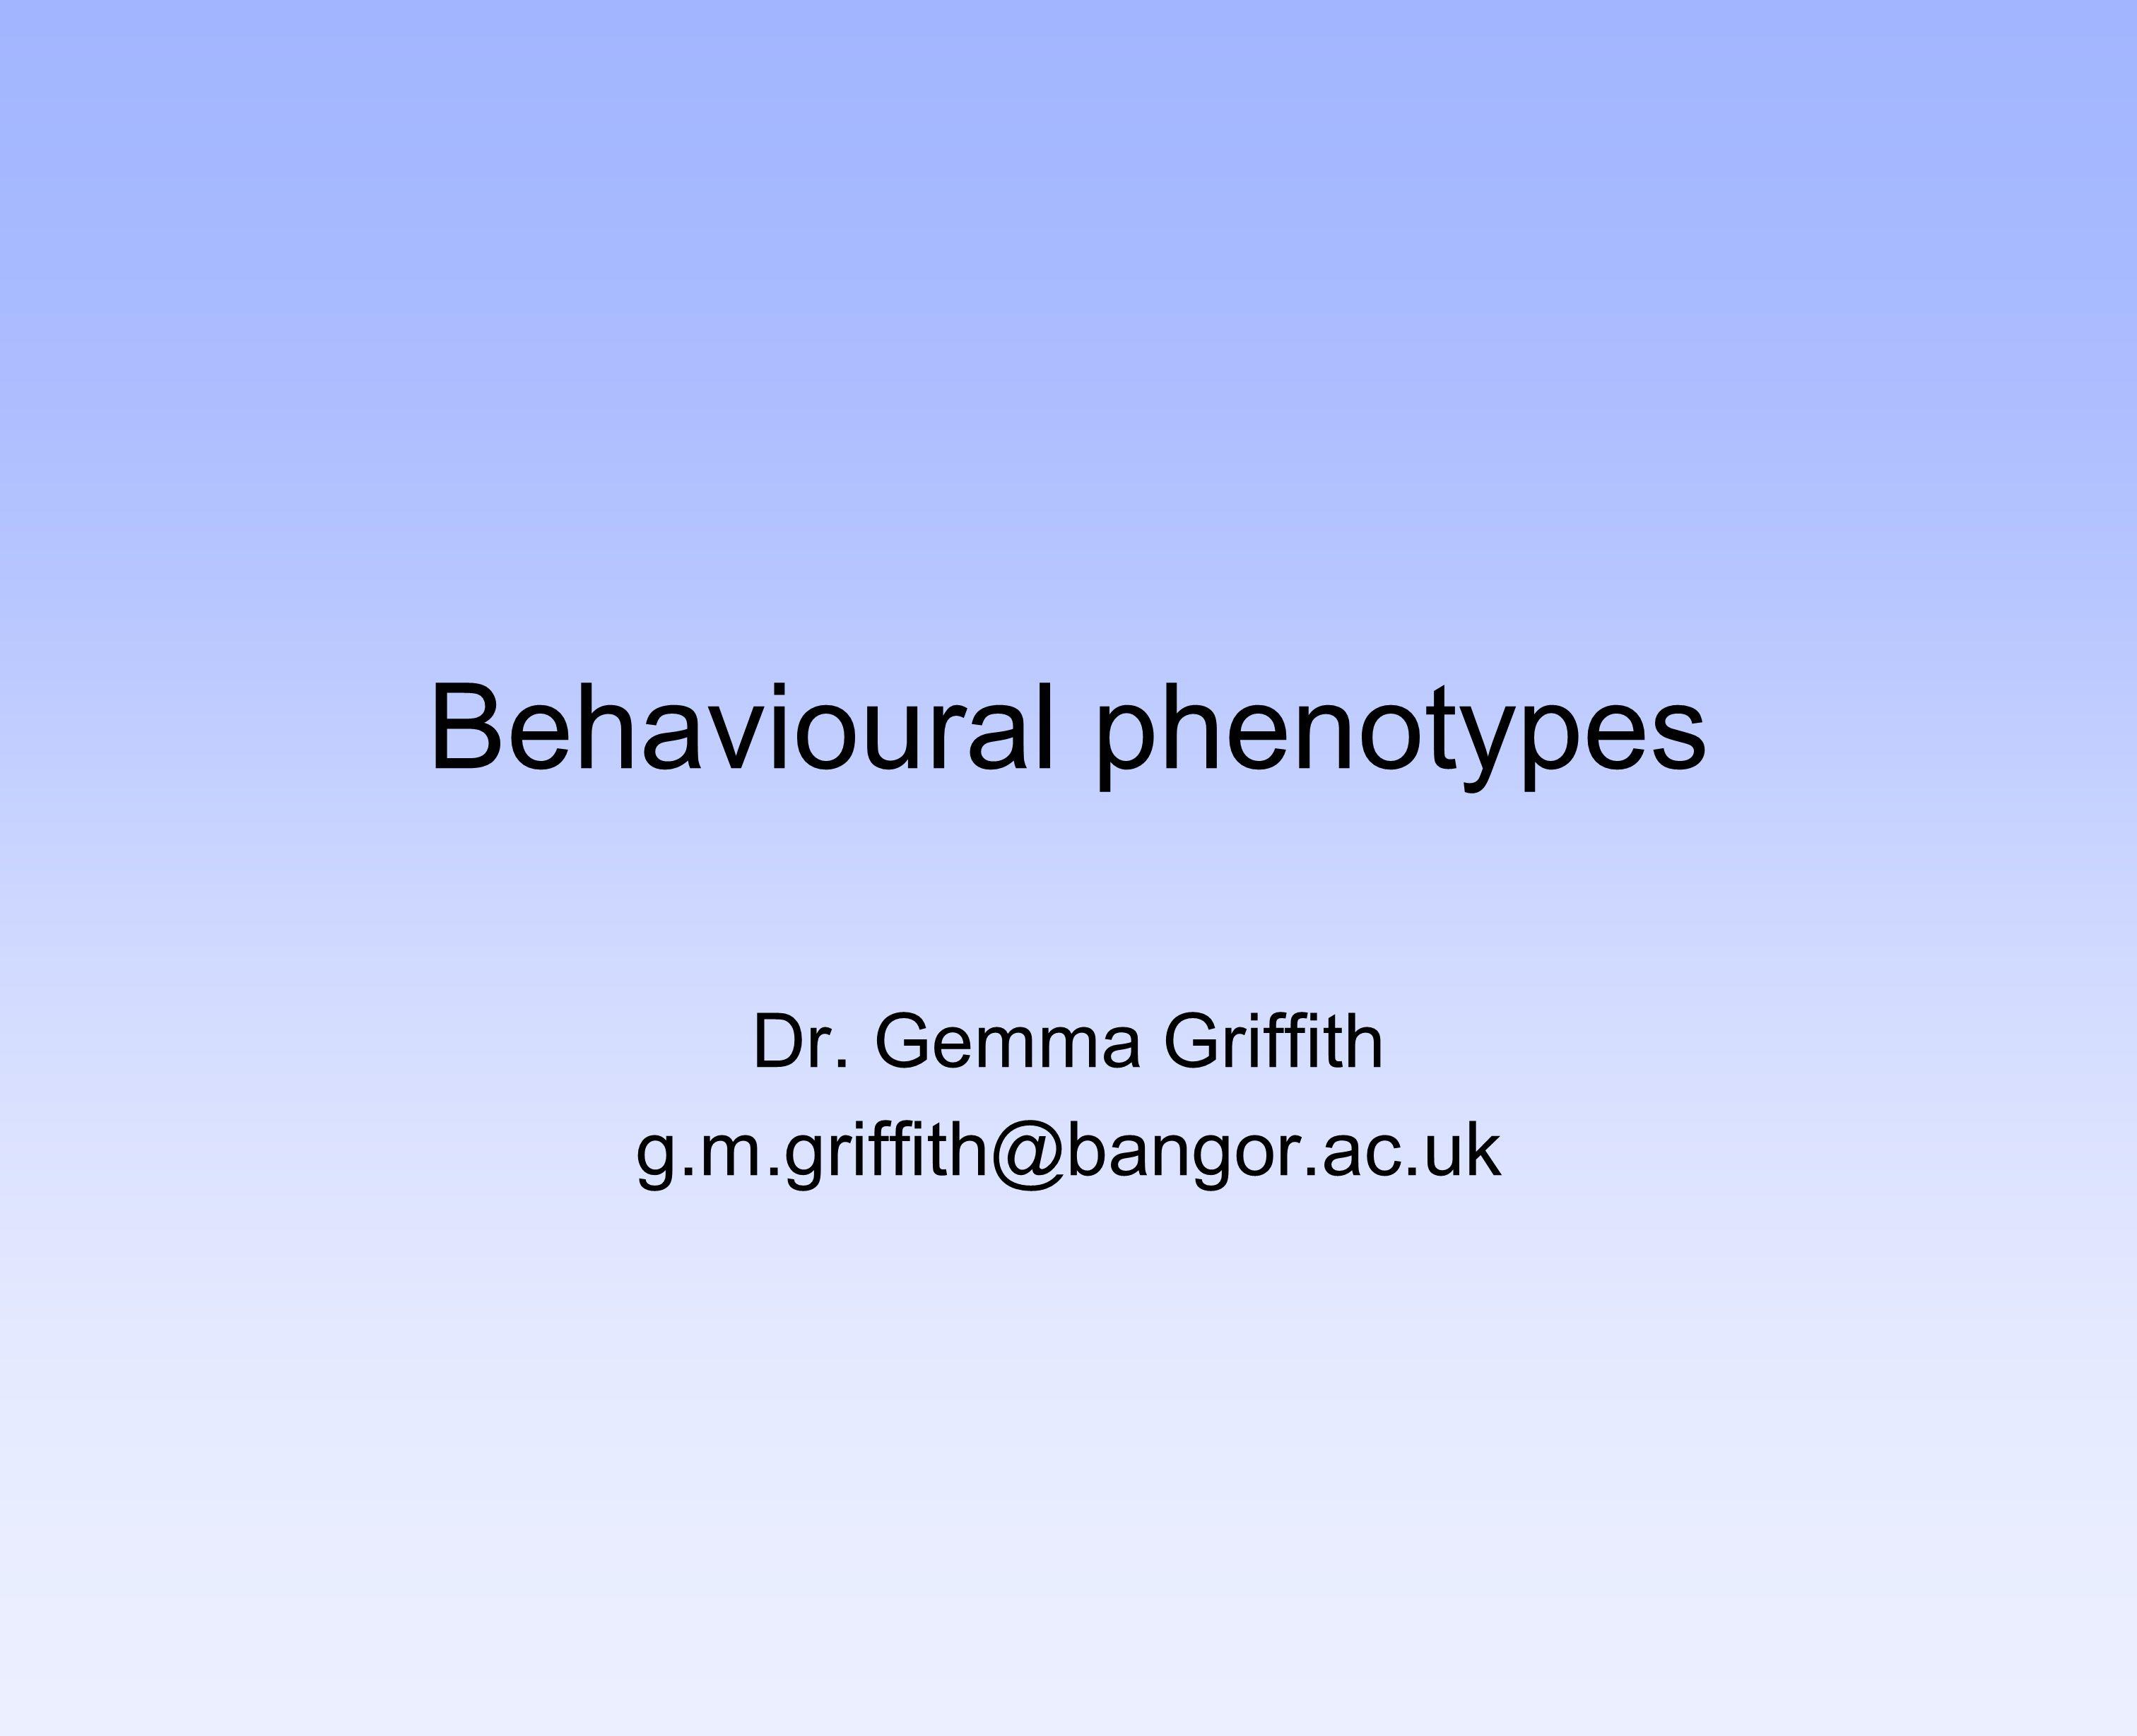 Behavioural phenotypes Dr. Gemma Griffith g.m.griffith@bangor.ac.uk